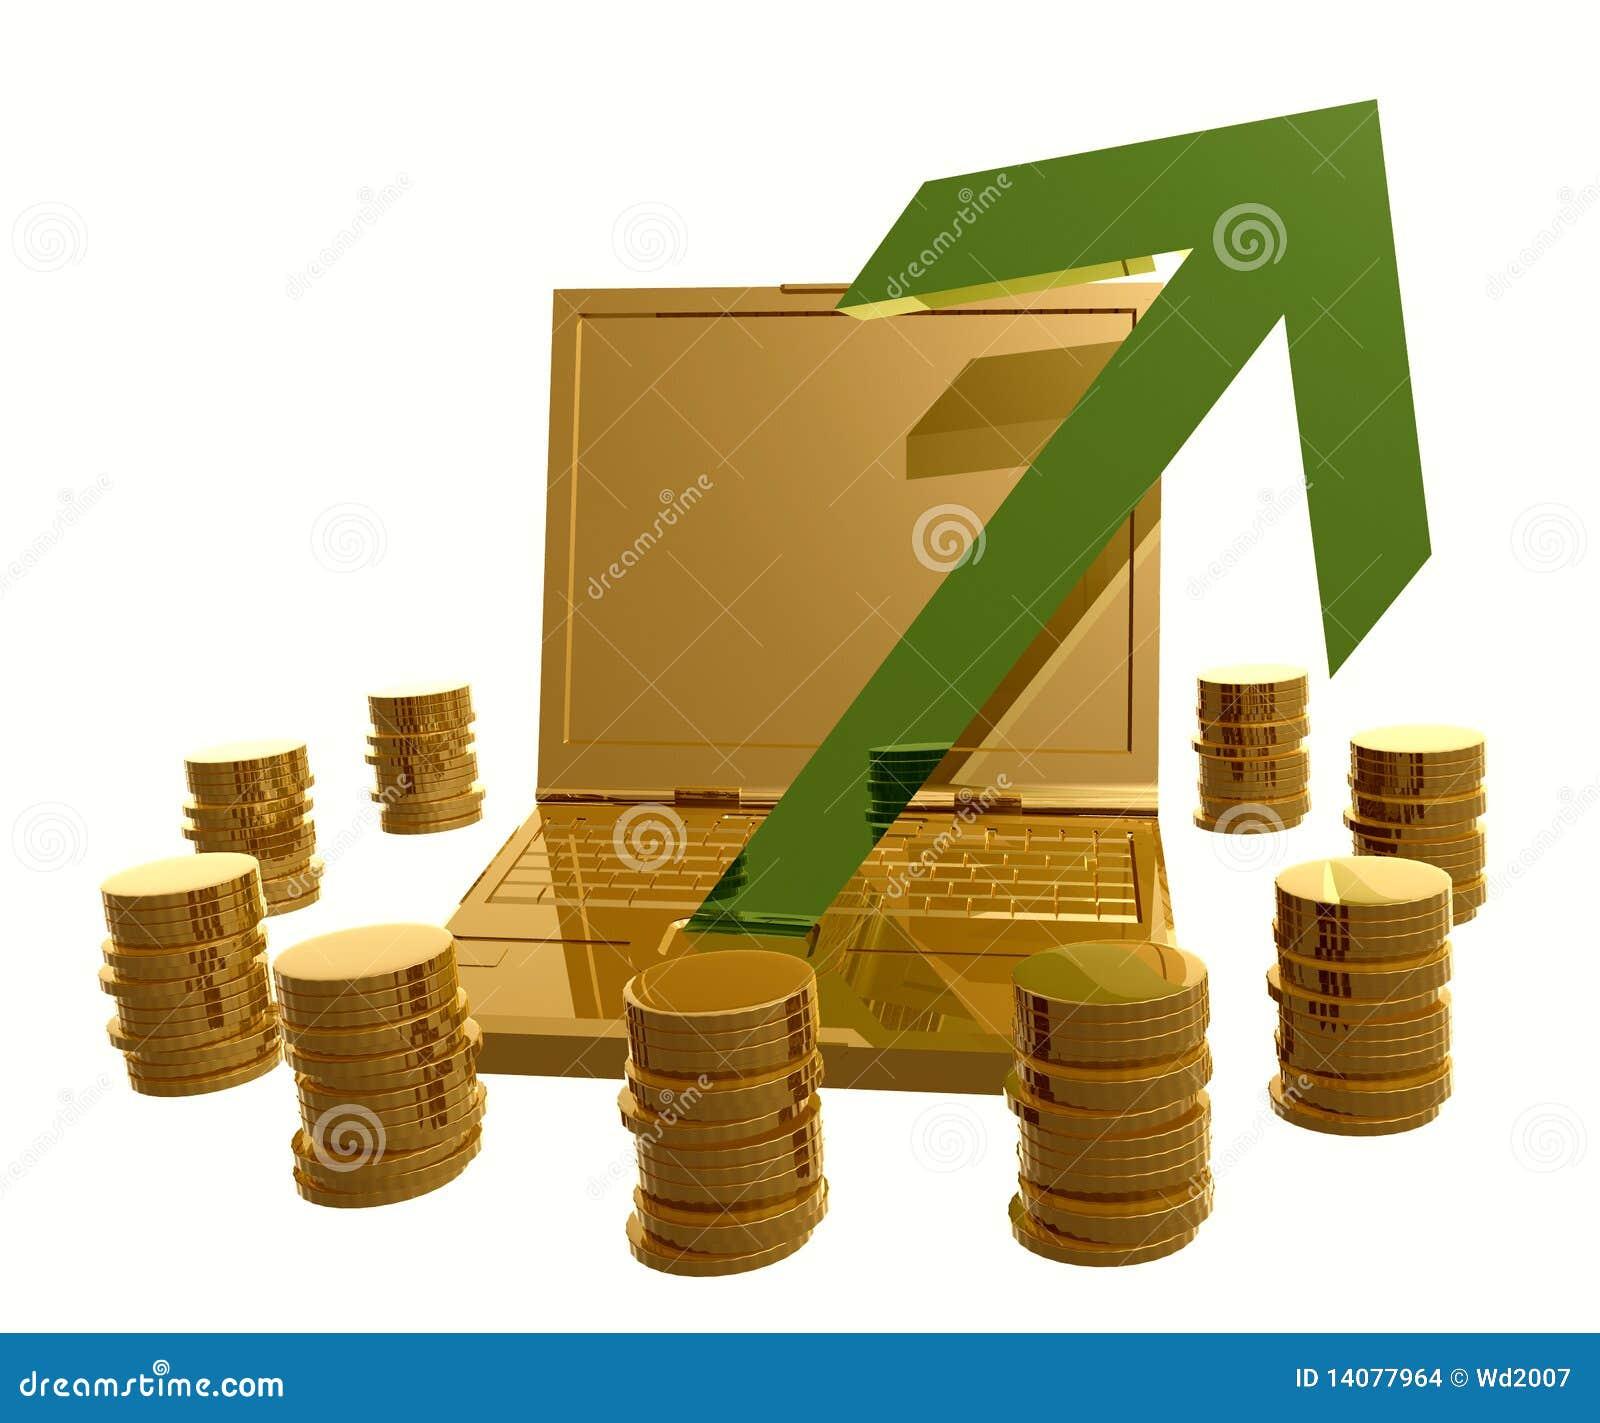 I online share brokers